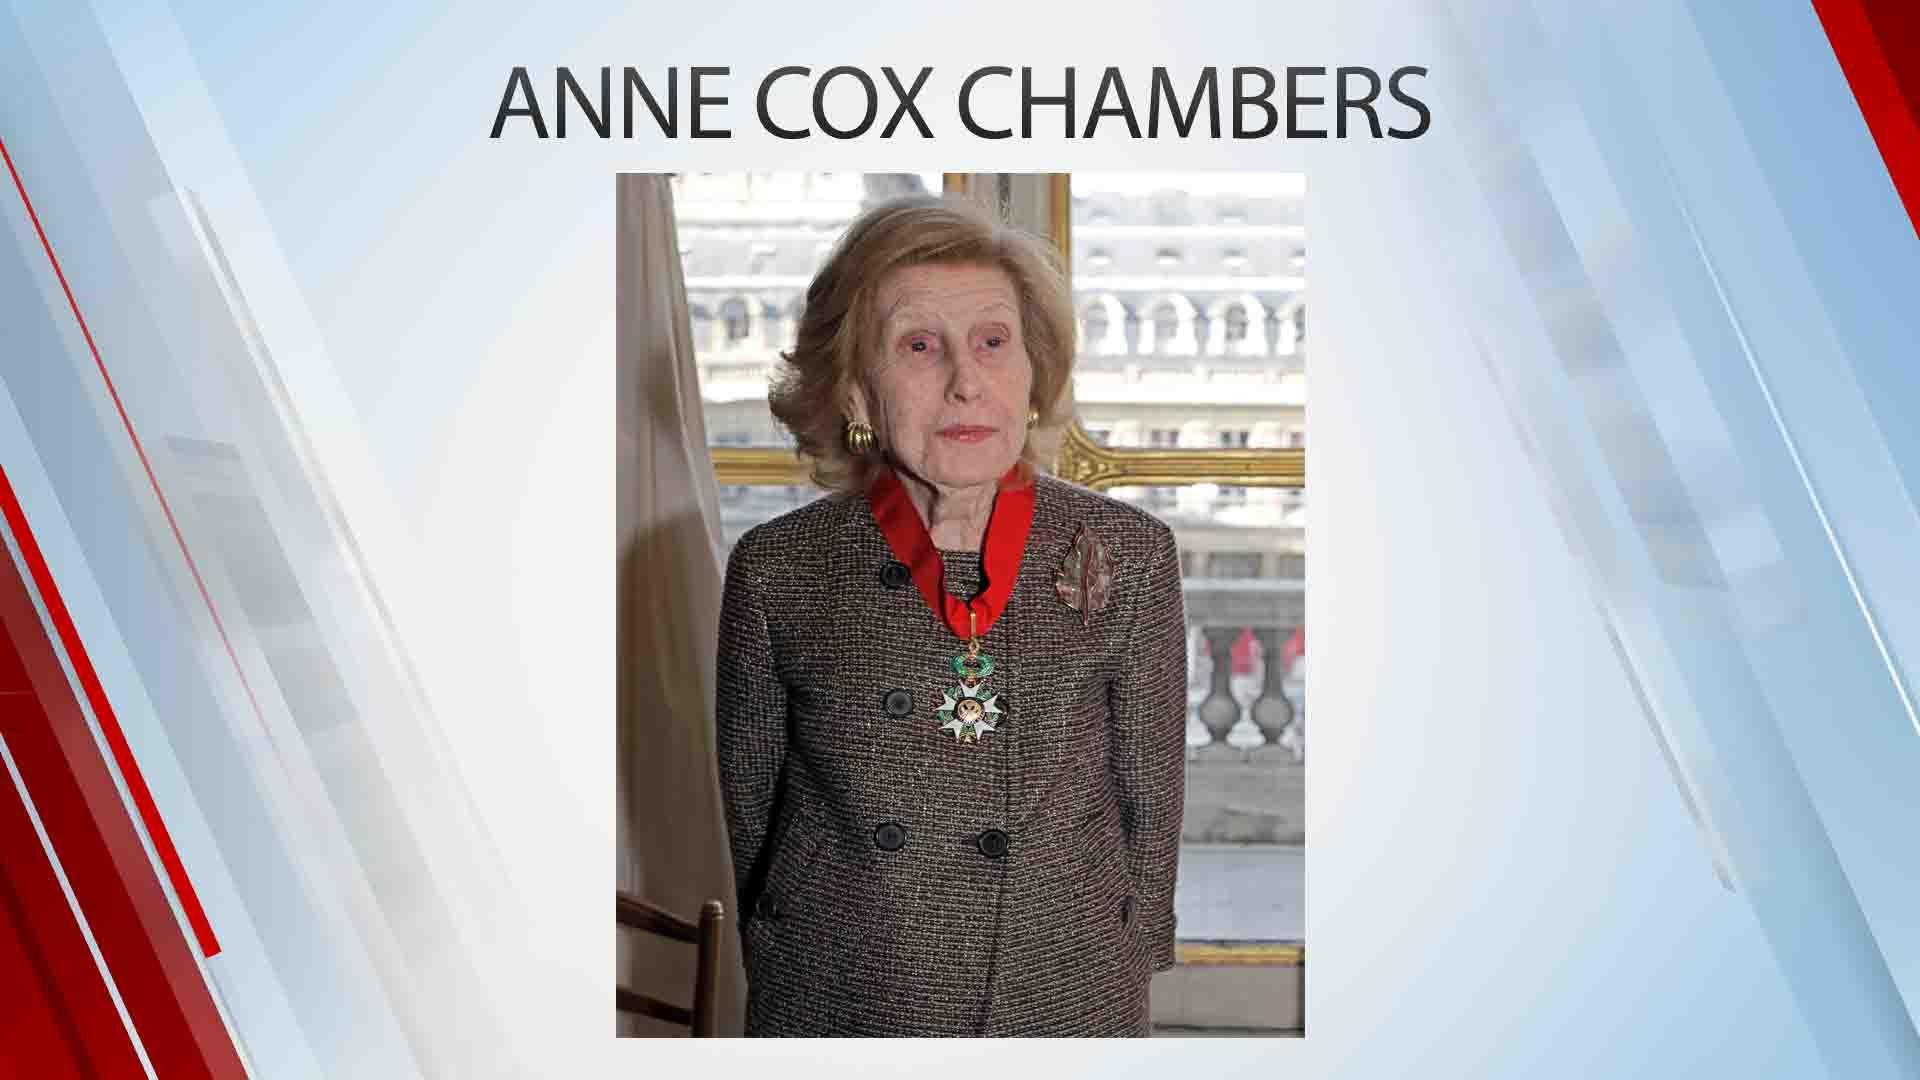 Anne Cox Chambers, Wealthy Newspaper Heiress, Dies At 100